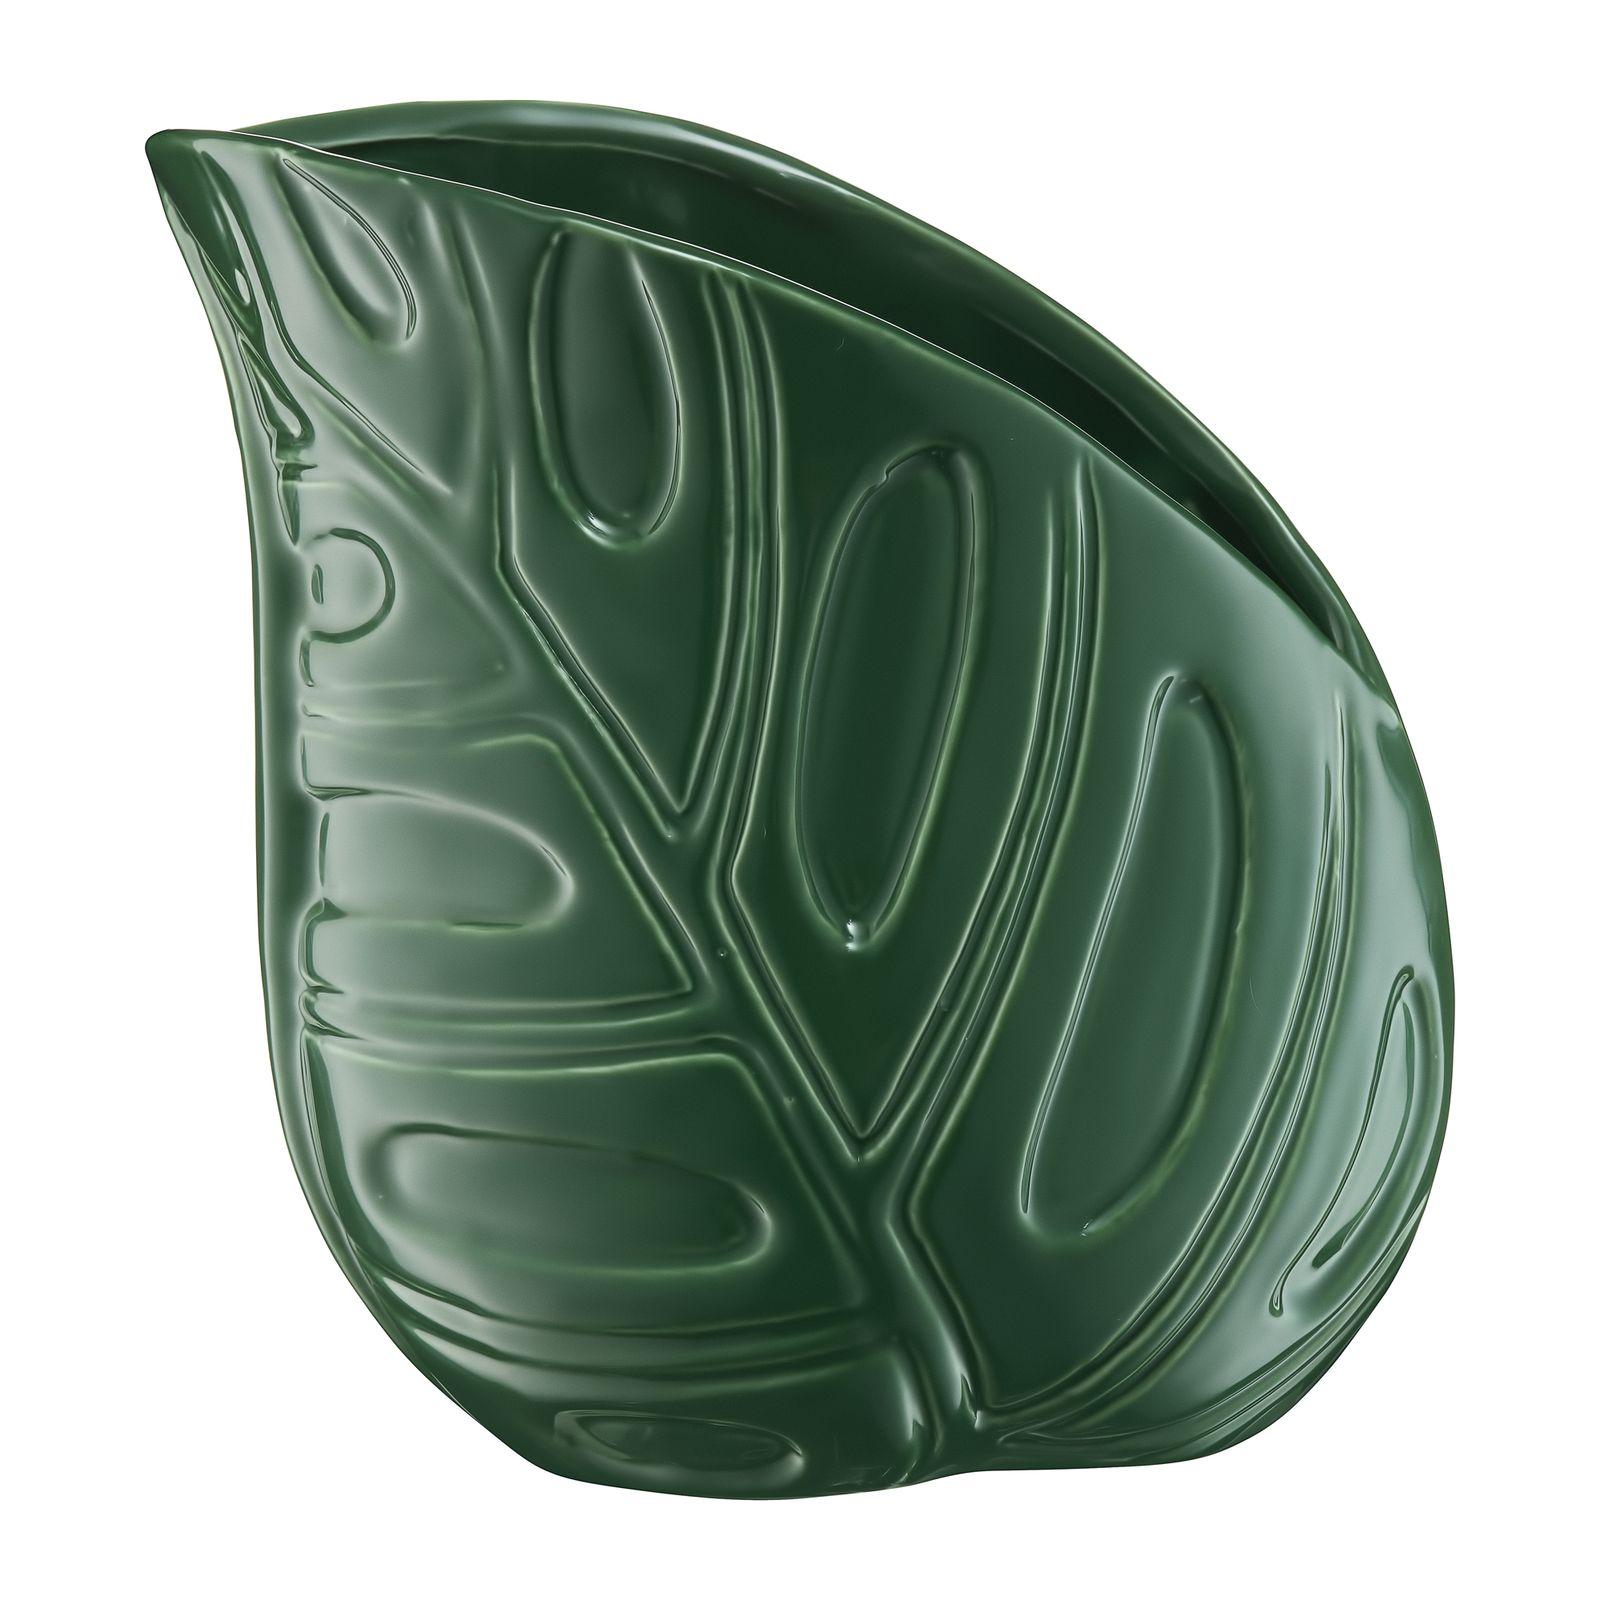 Vaso decorativo Leaf 15,5 x 10 x 16,5 cm MY HOME